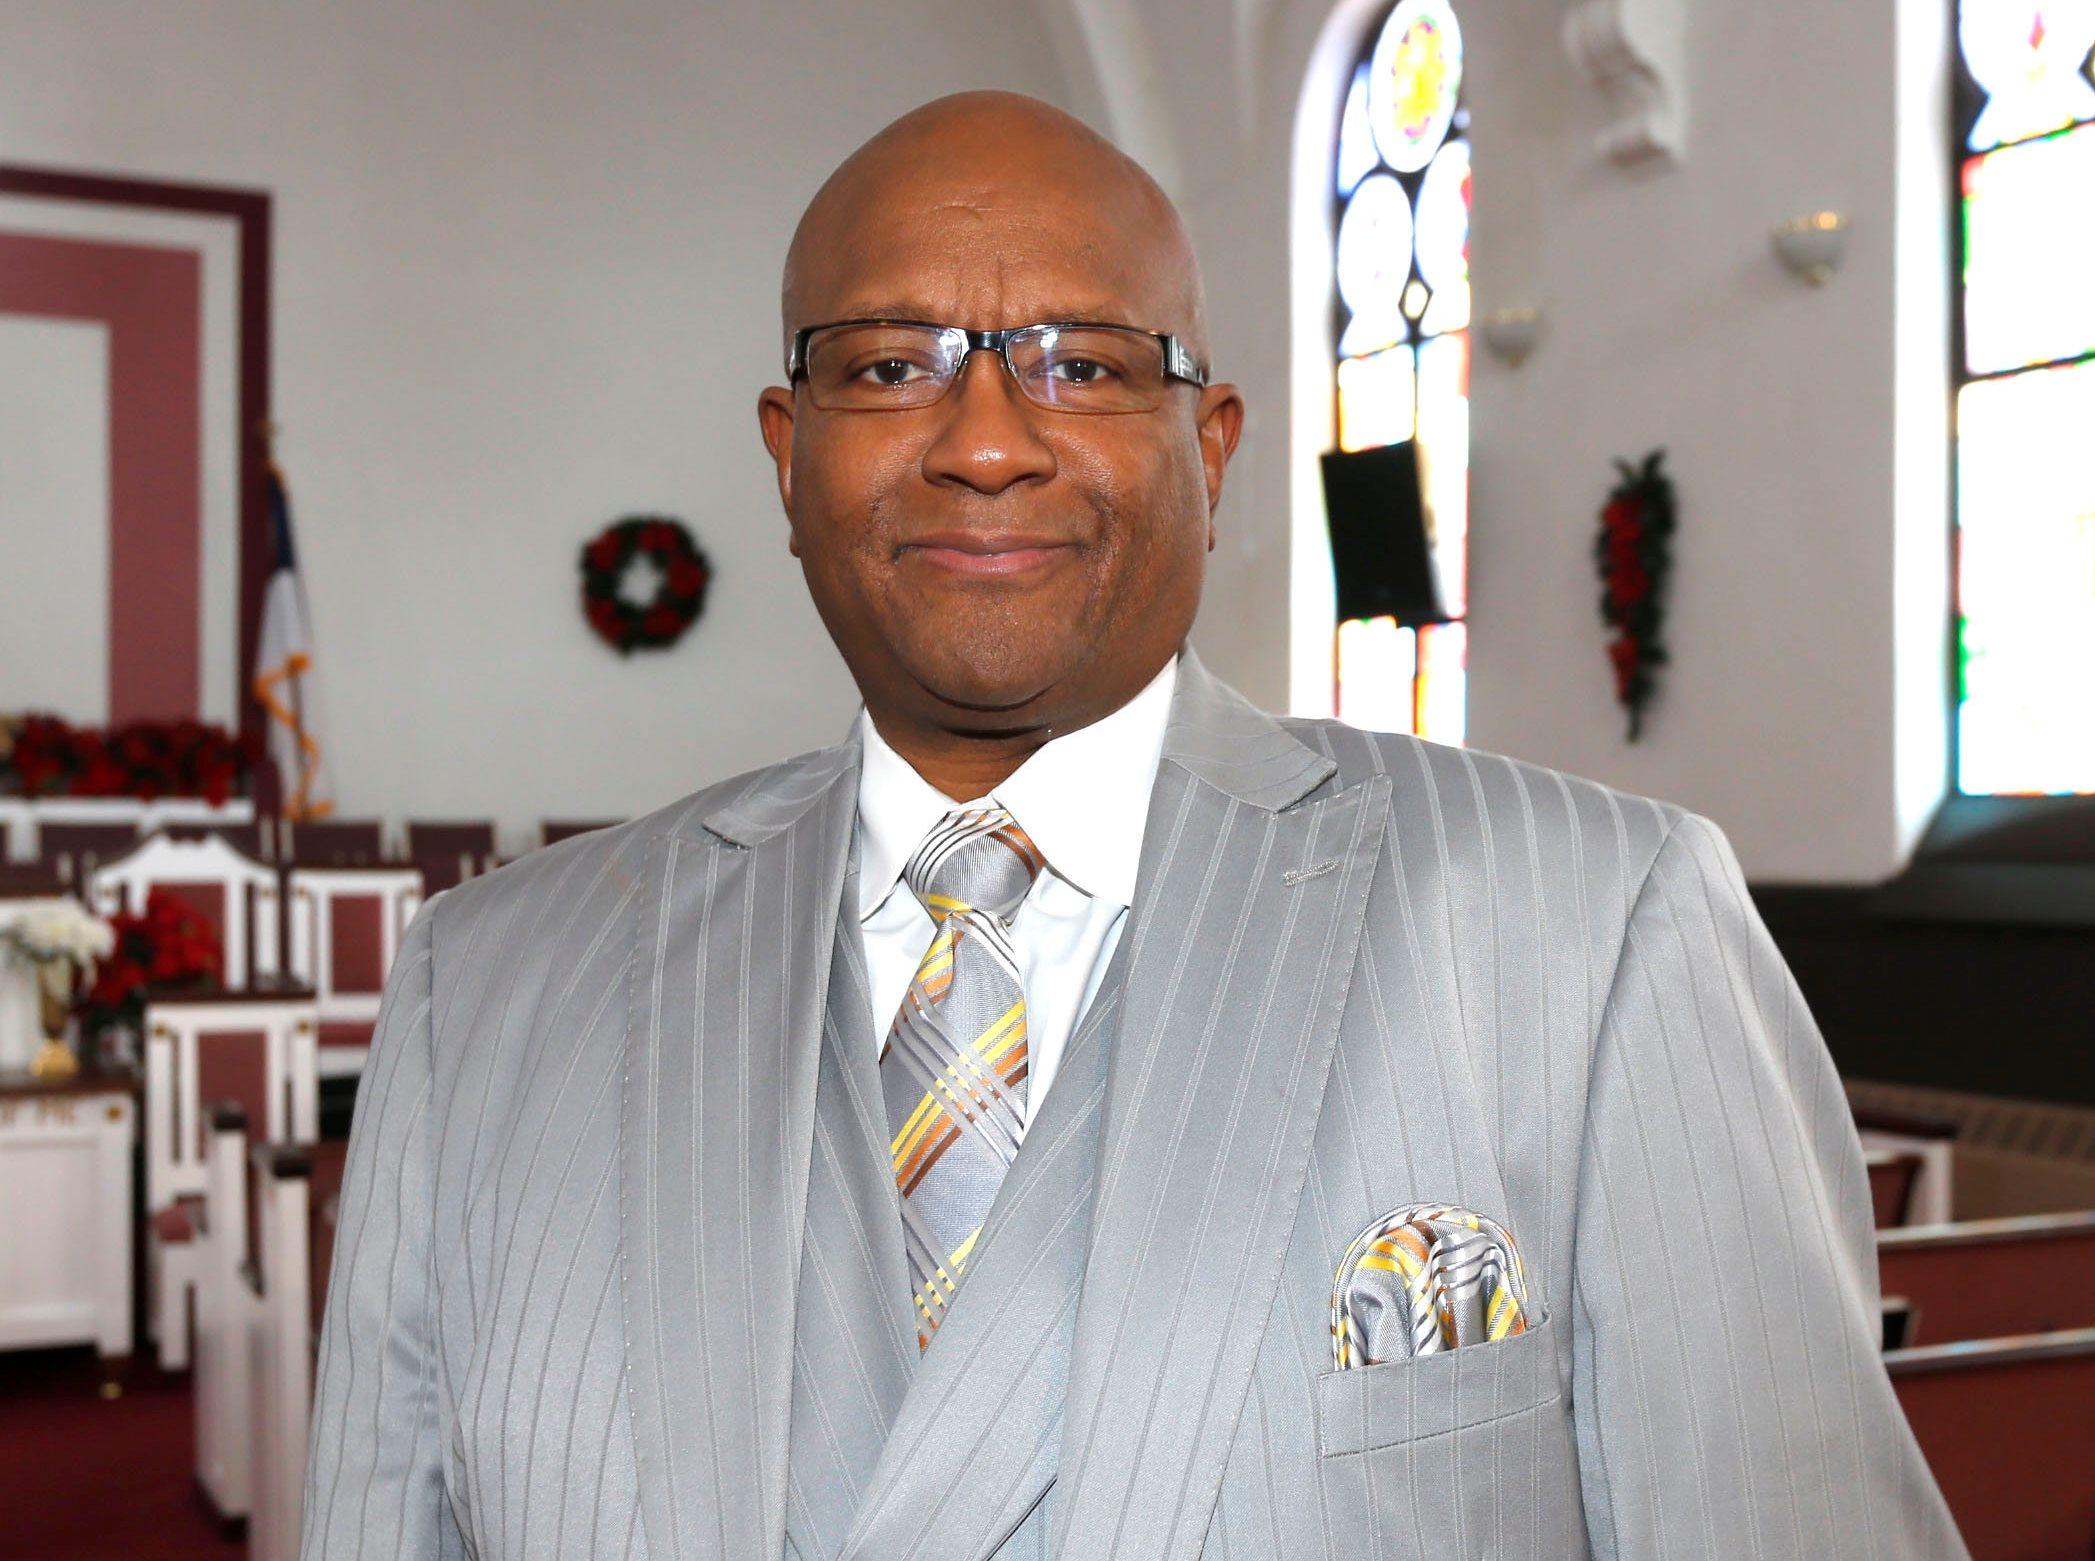 Rev. Mark E. Blue, pastor of Second Baptist Church in Lackawanna, is the new president of the Buffalo Branch of the NAACP. (Robert Kirkham/Buffalo News)